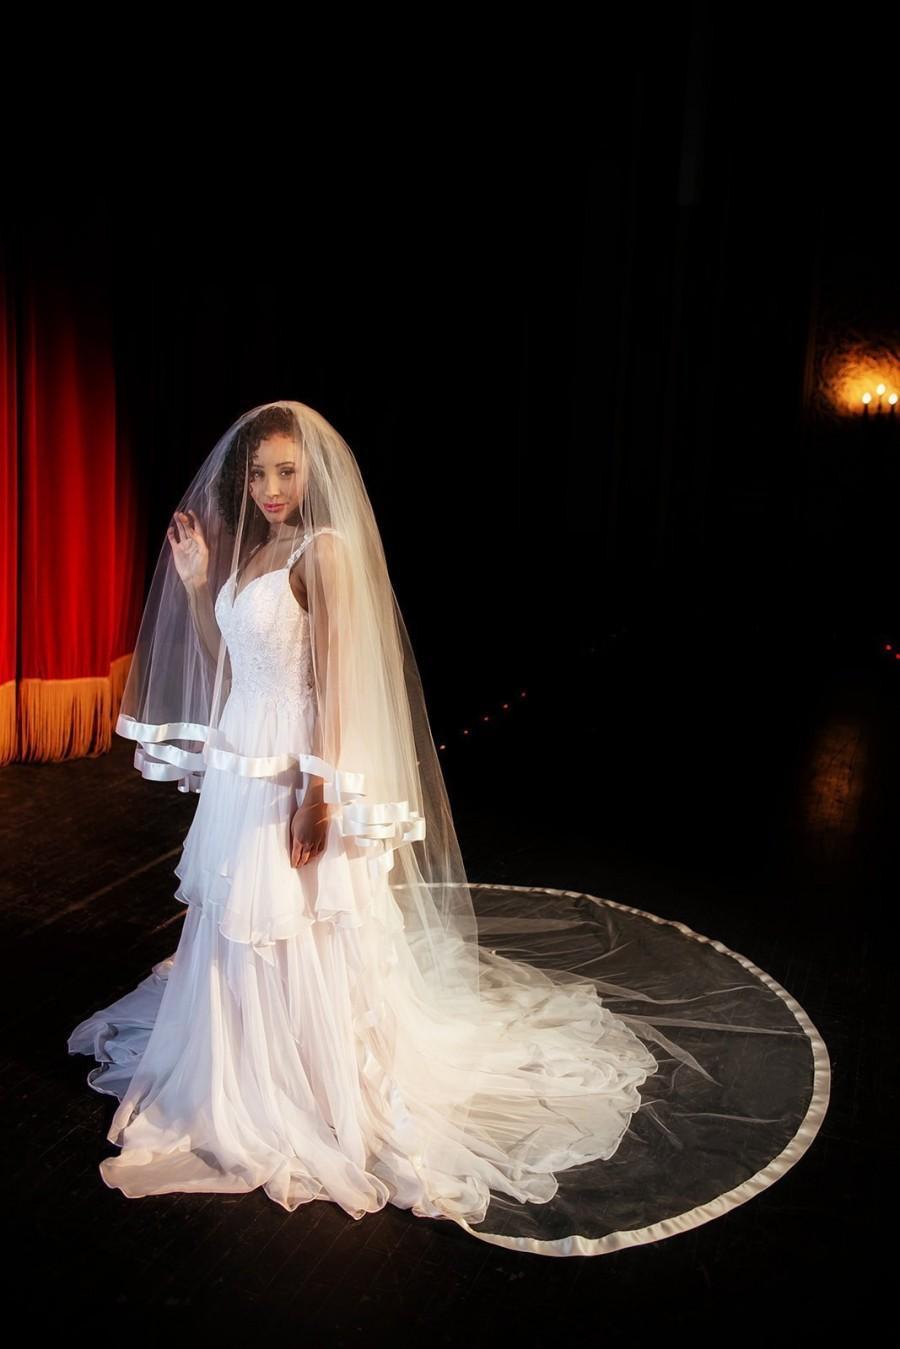 زفاف - Full cathedral wedding veil with satin or organza trim - cathedral veil with blusher - Style 1150